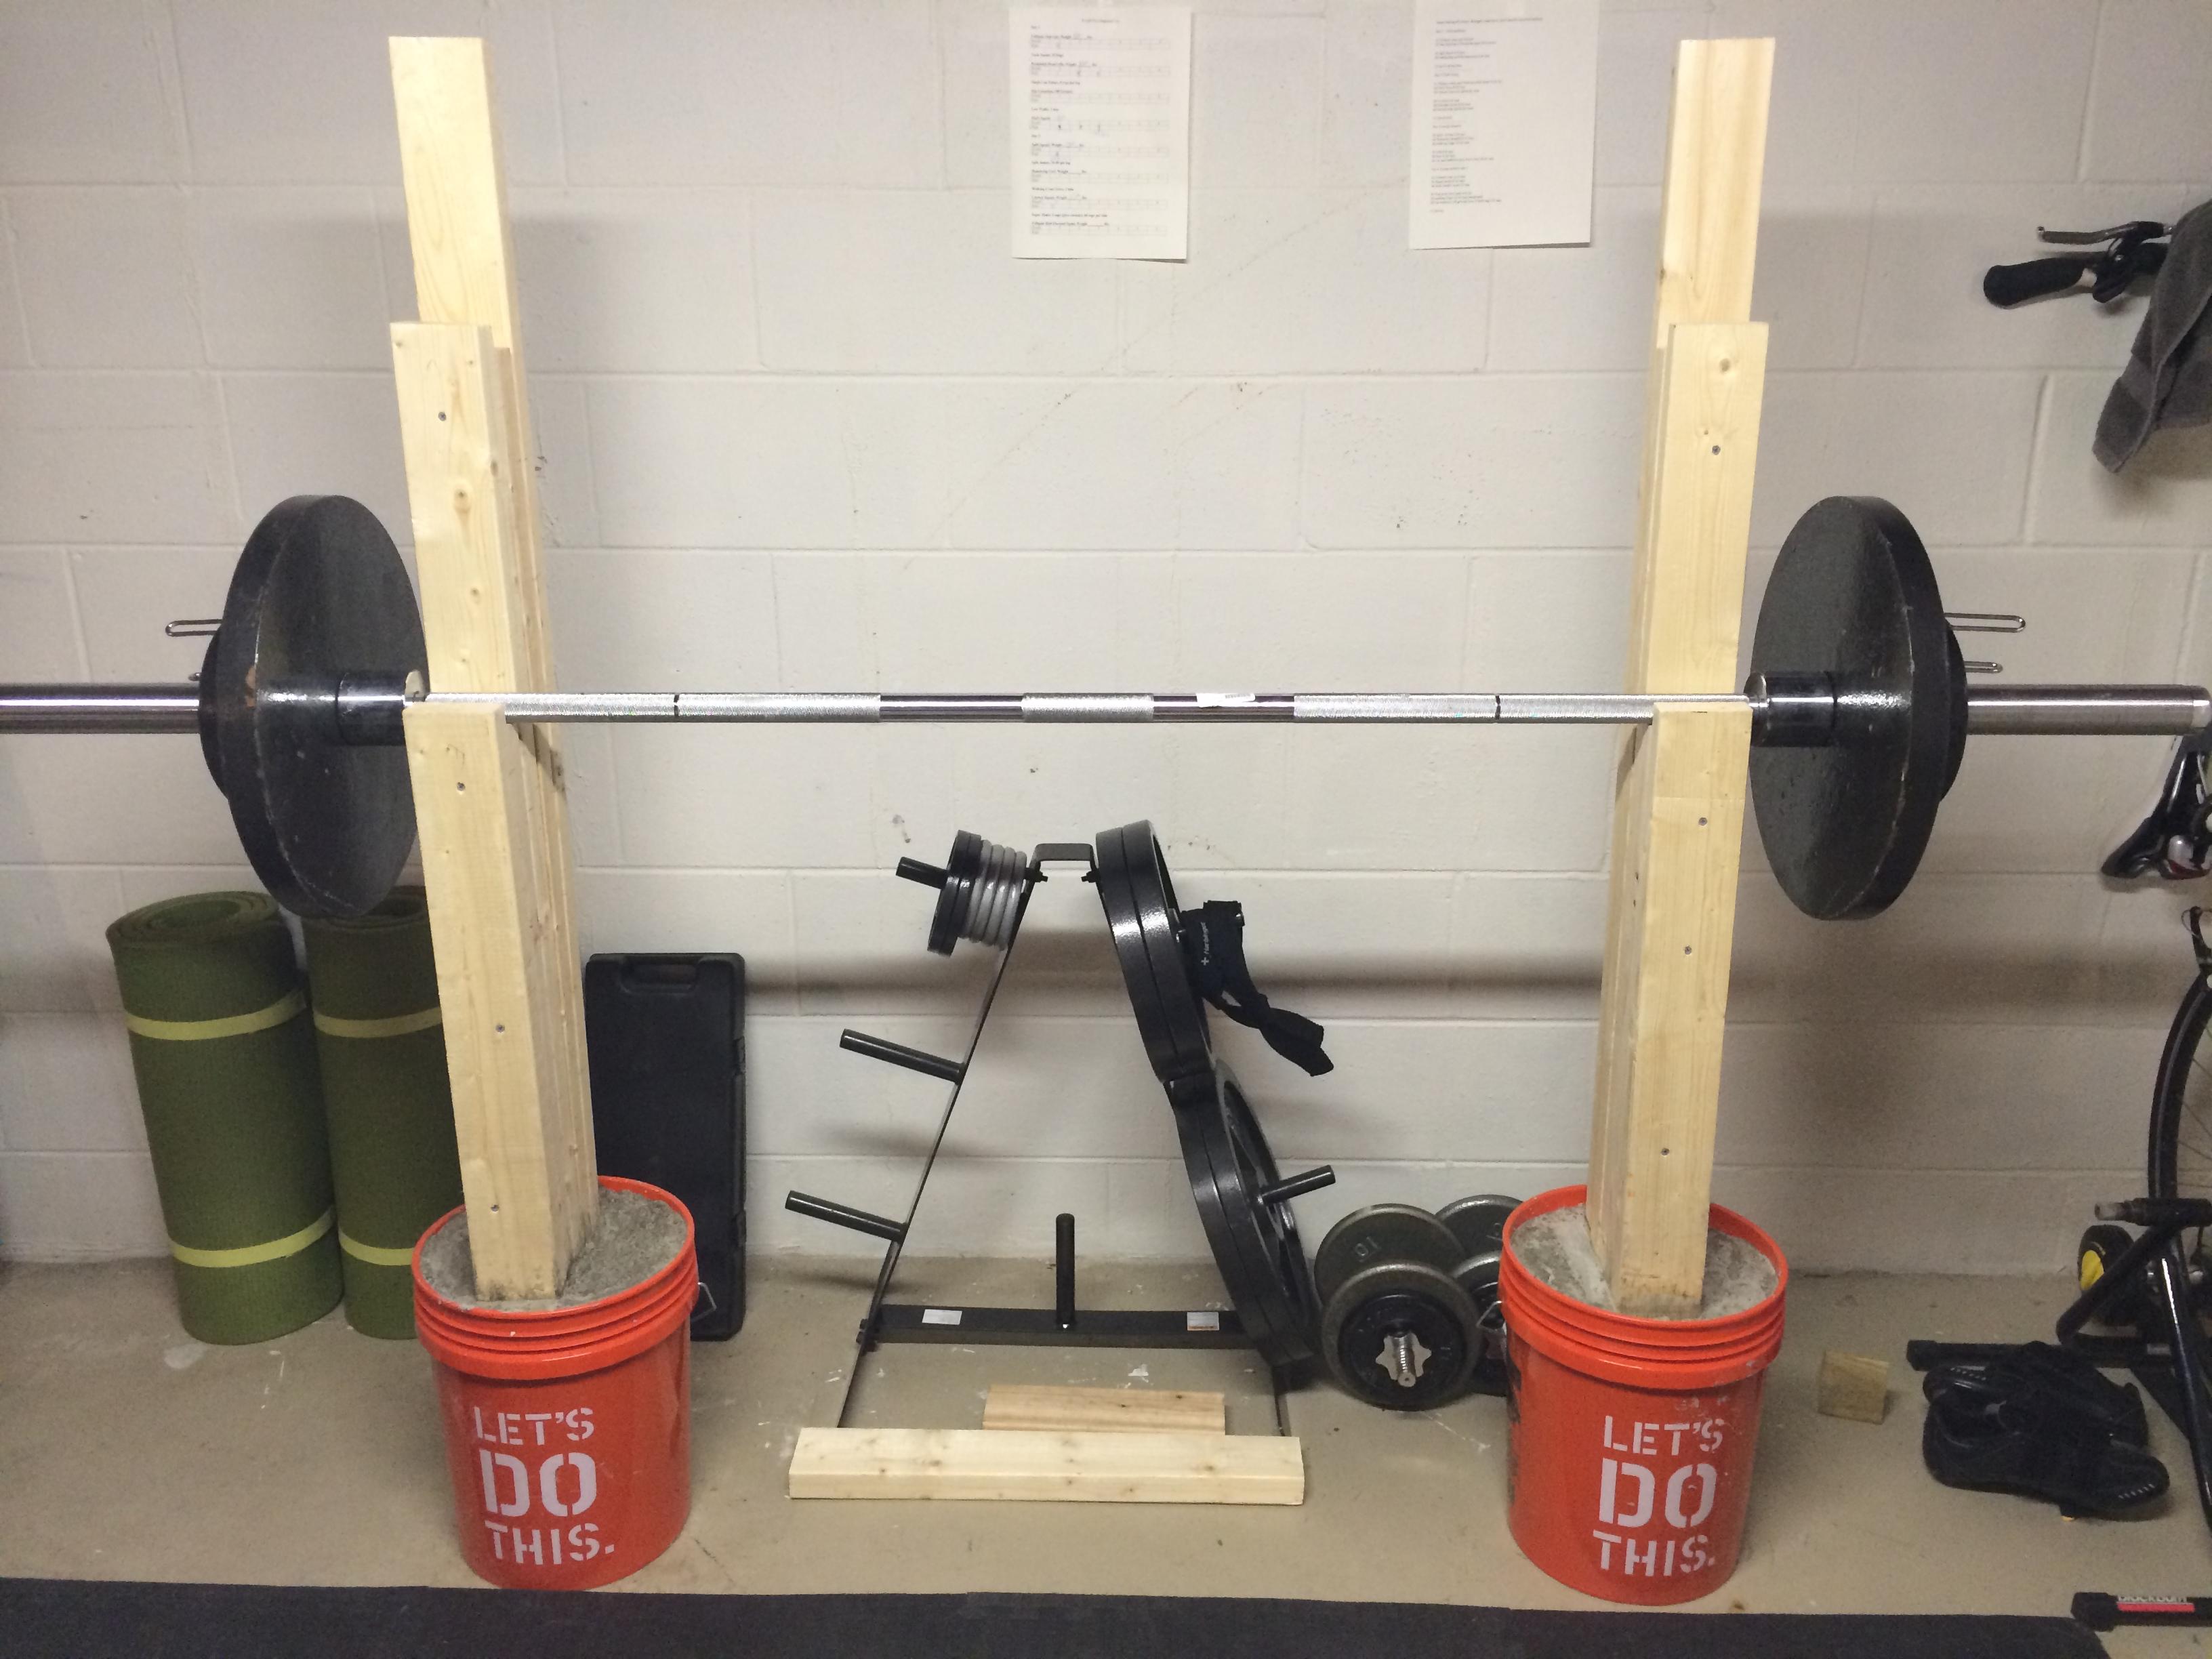 Ideas homemade weight bench plans big idea for Homemade weight rack plans